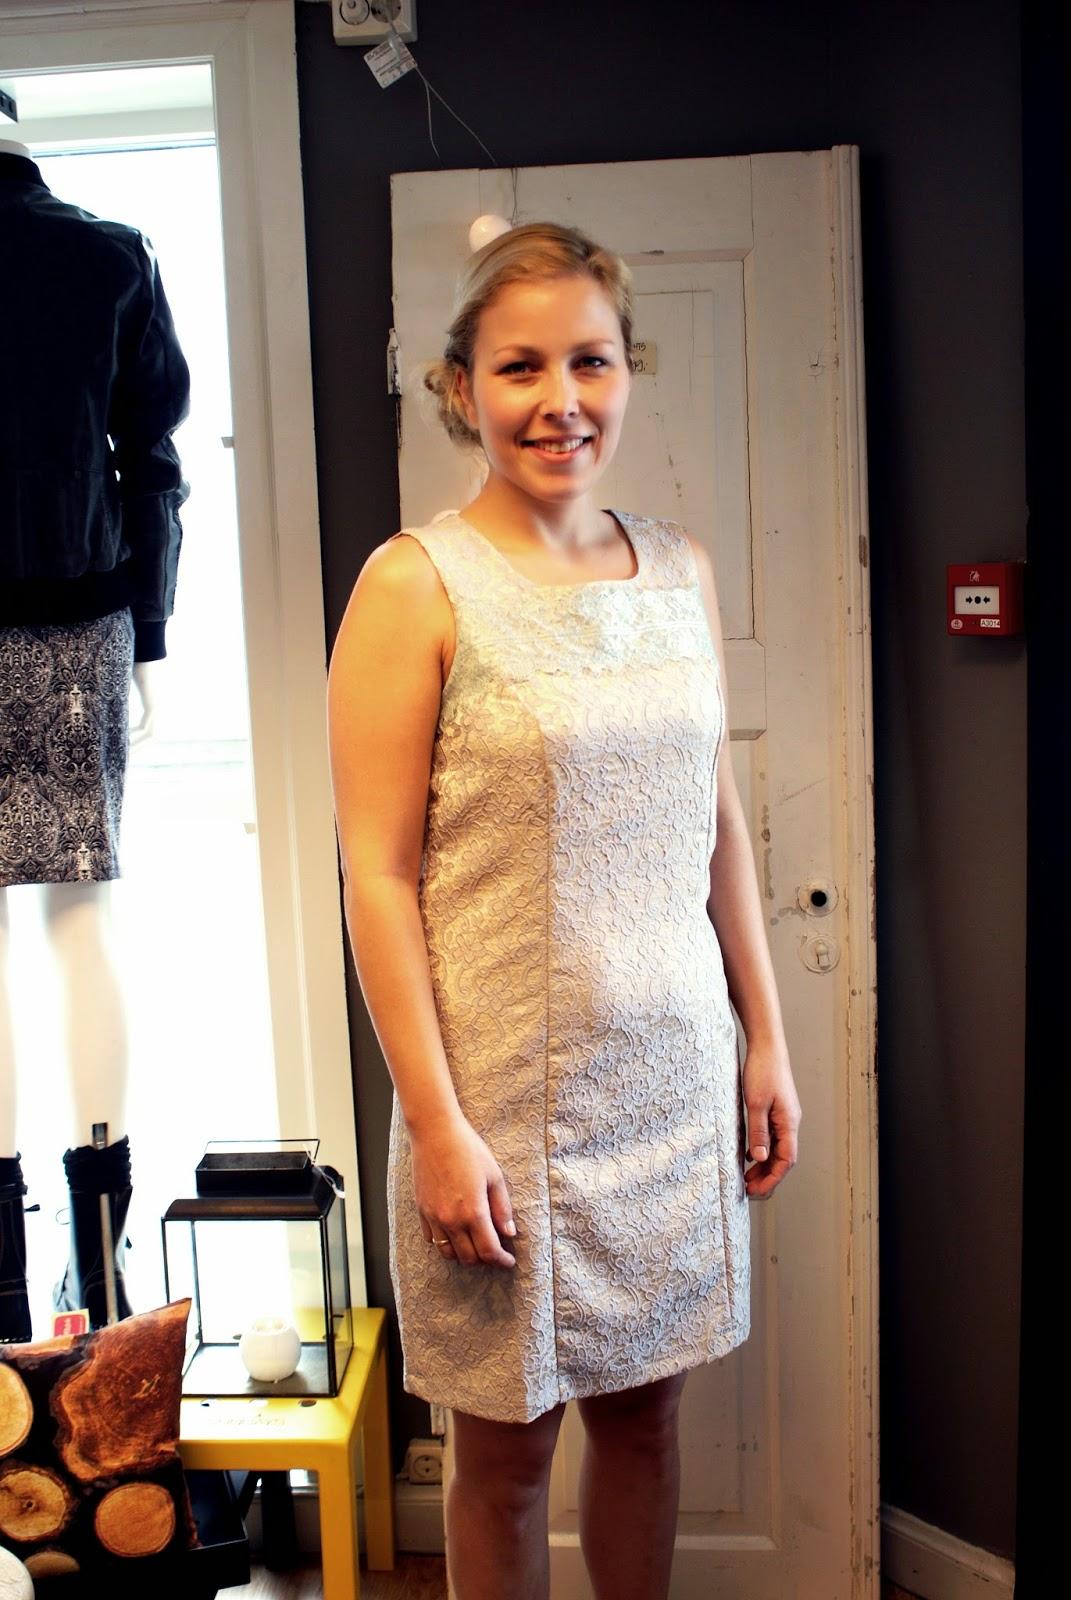 Allehaande Lillesand: Flotte kjoler fra Container, Minus, One-of, og Ilse Jacobsen!